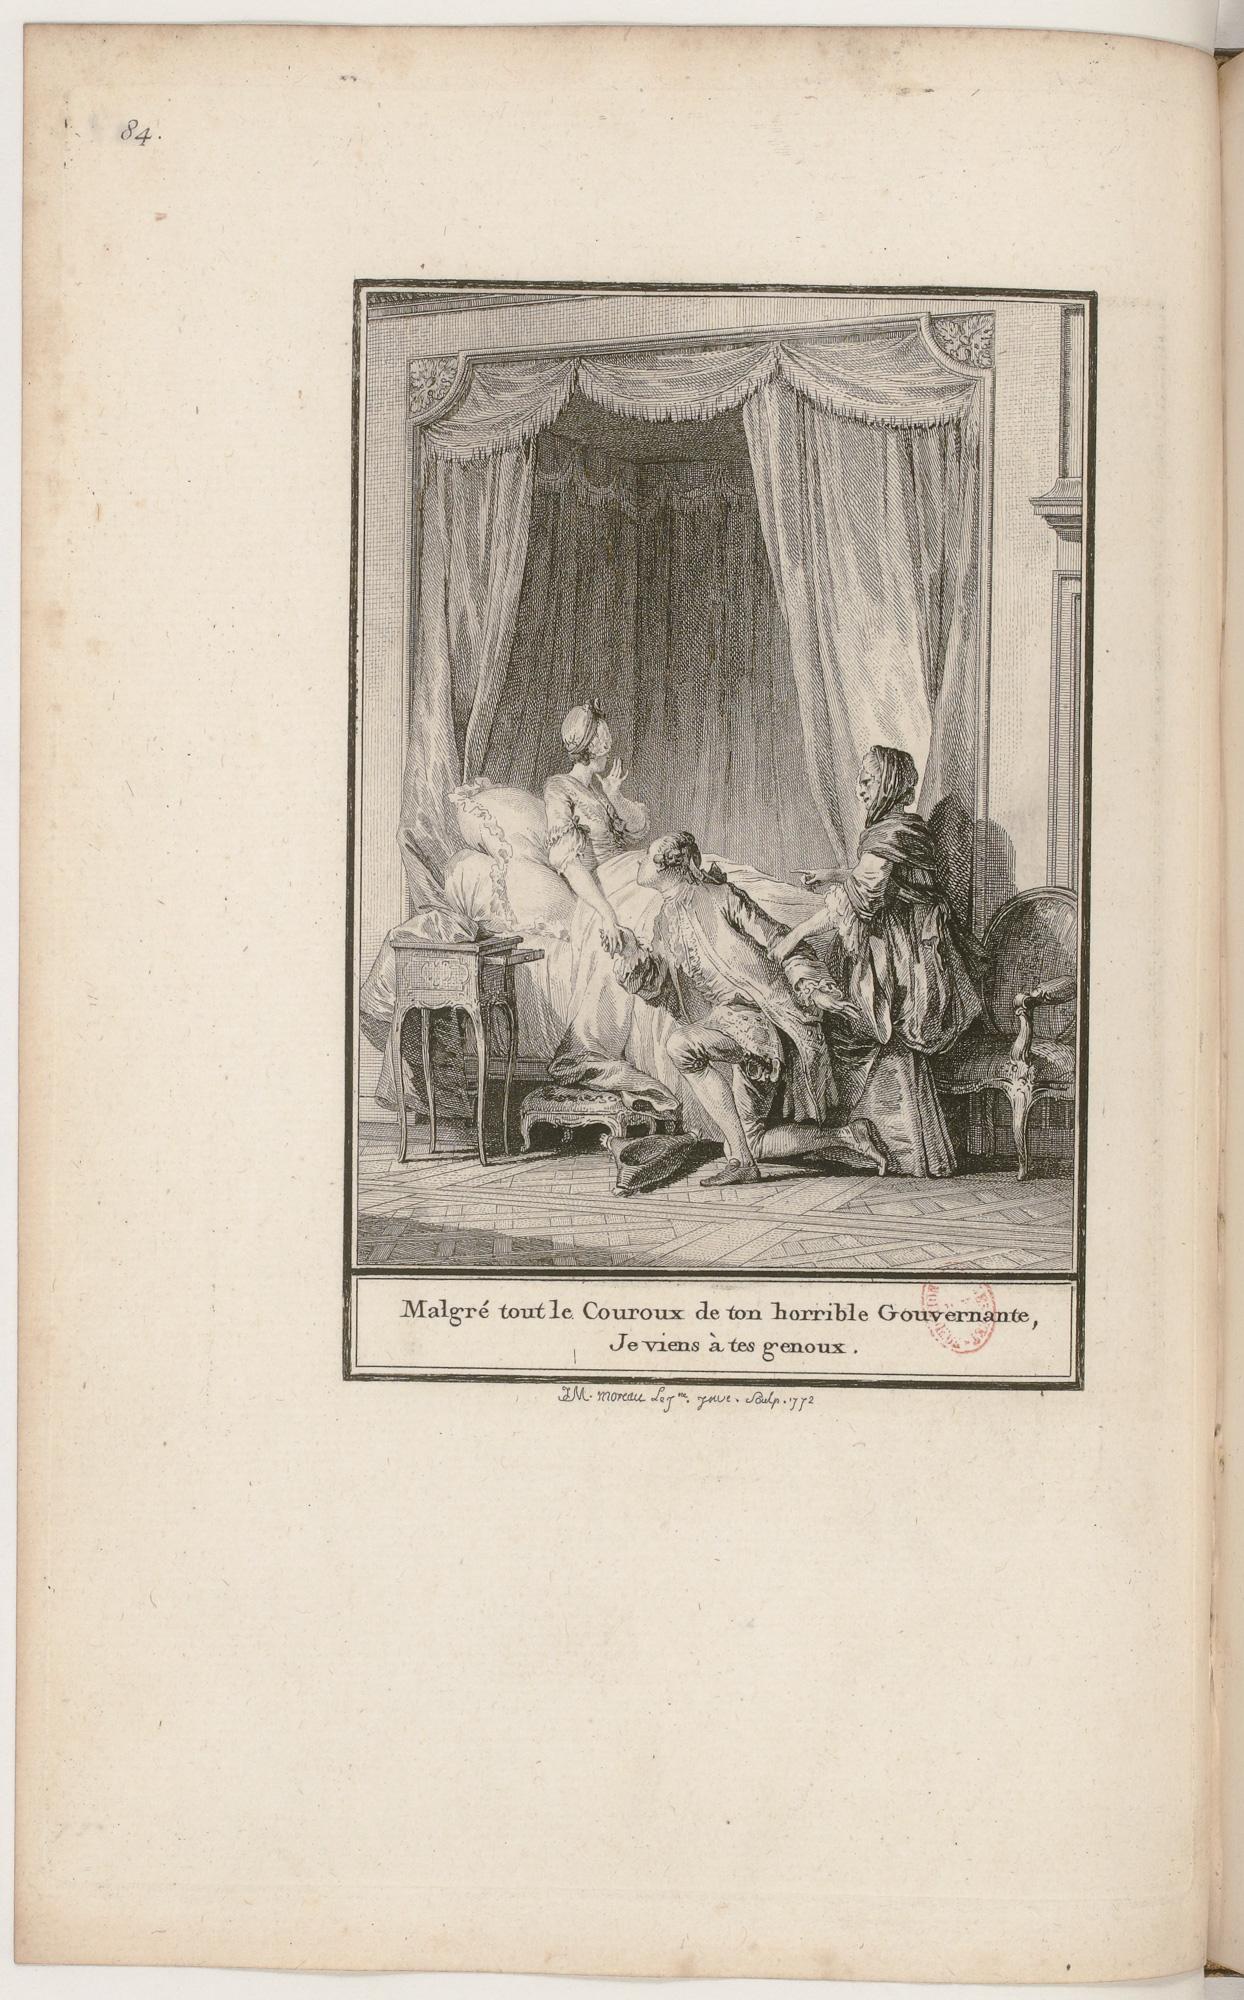 S.1.14 La fille mal gardée,1772, Image